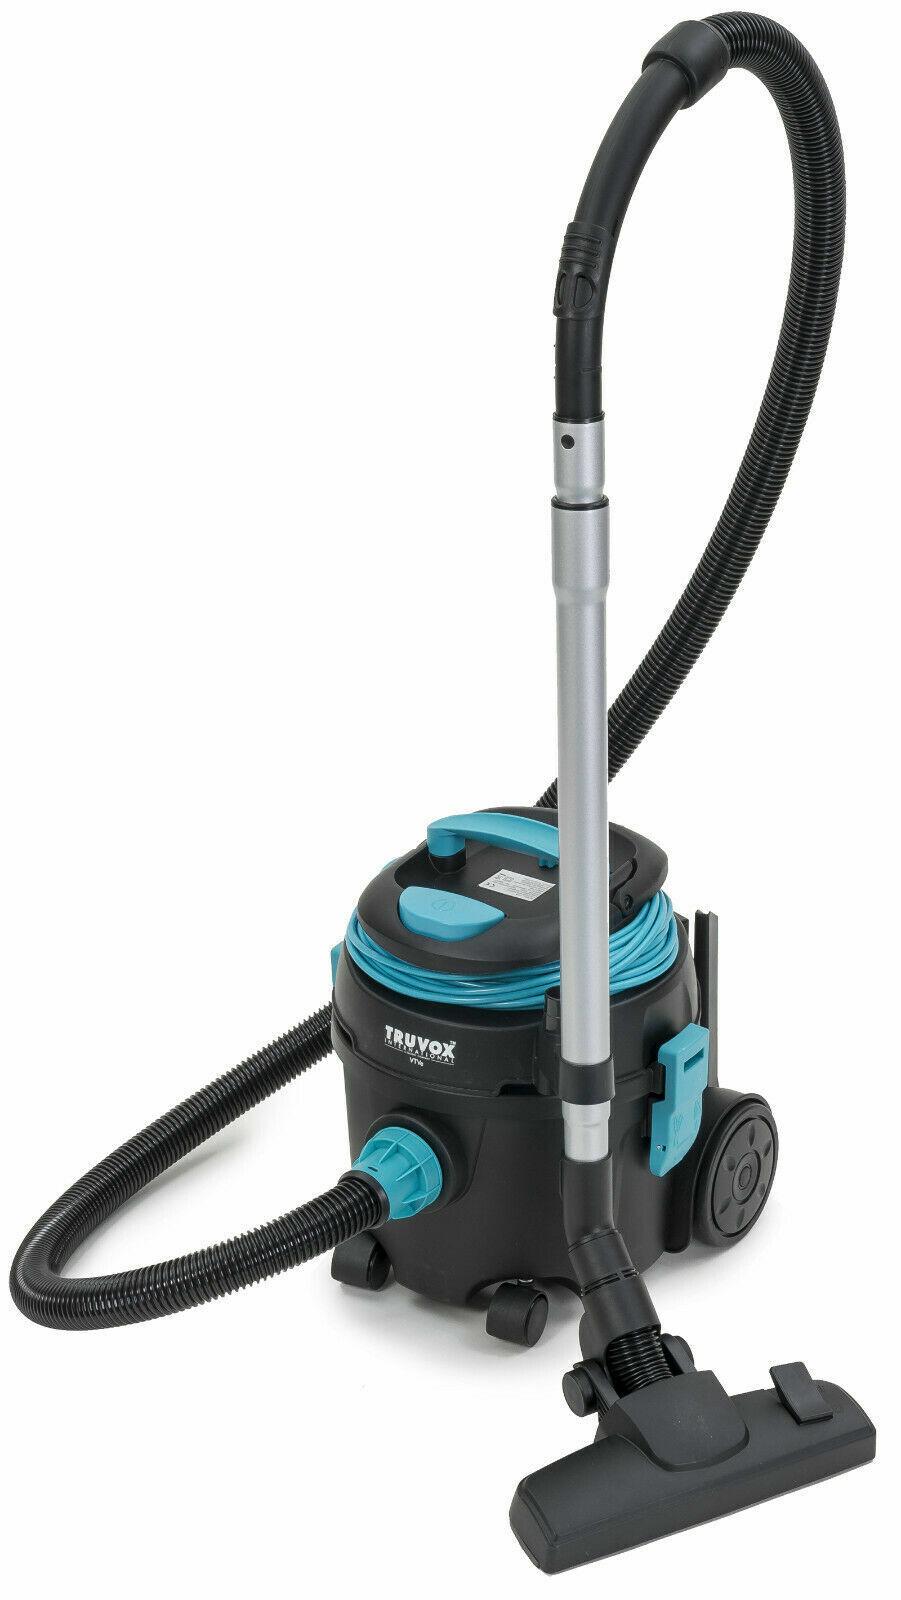 Truvox VTVe Commercial Dry Tub Vacuum Cleaner not numatic henry, Karcher T10/1